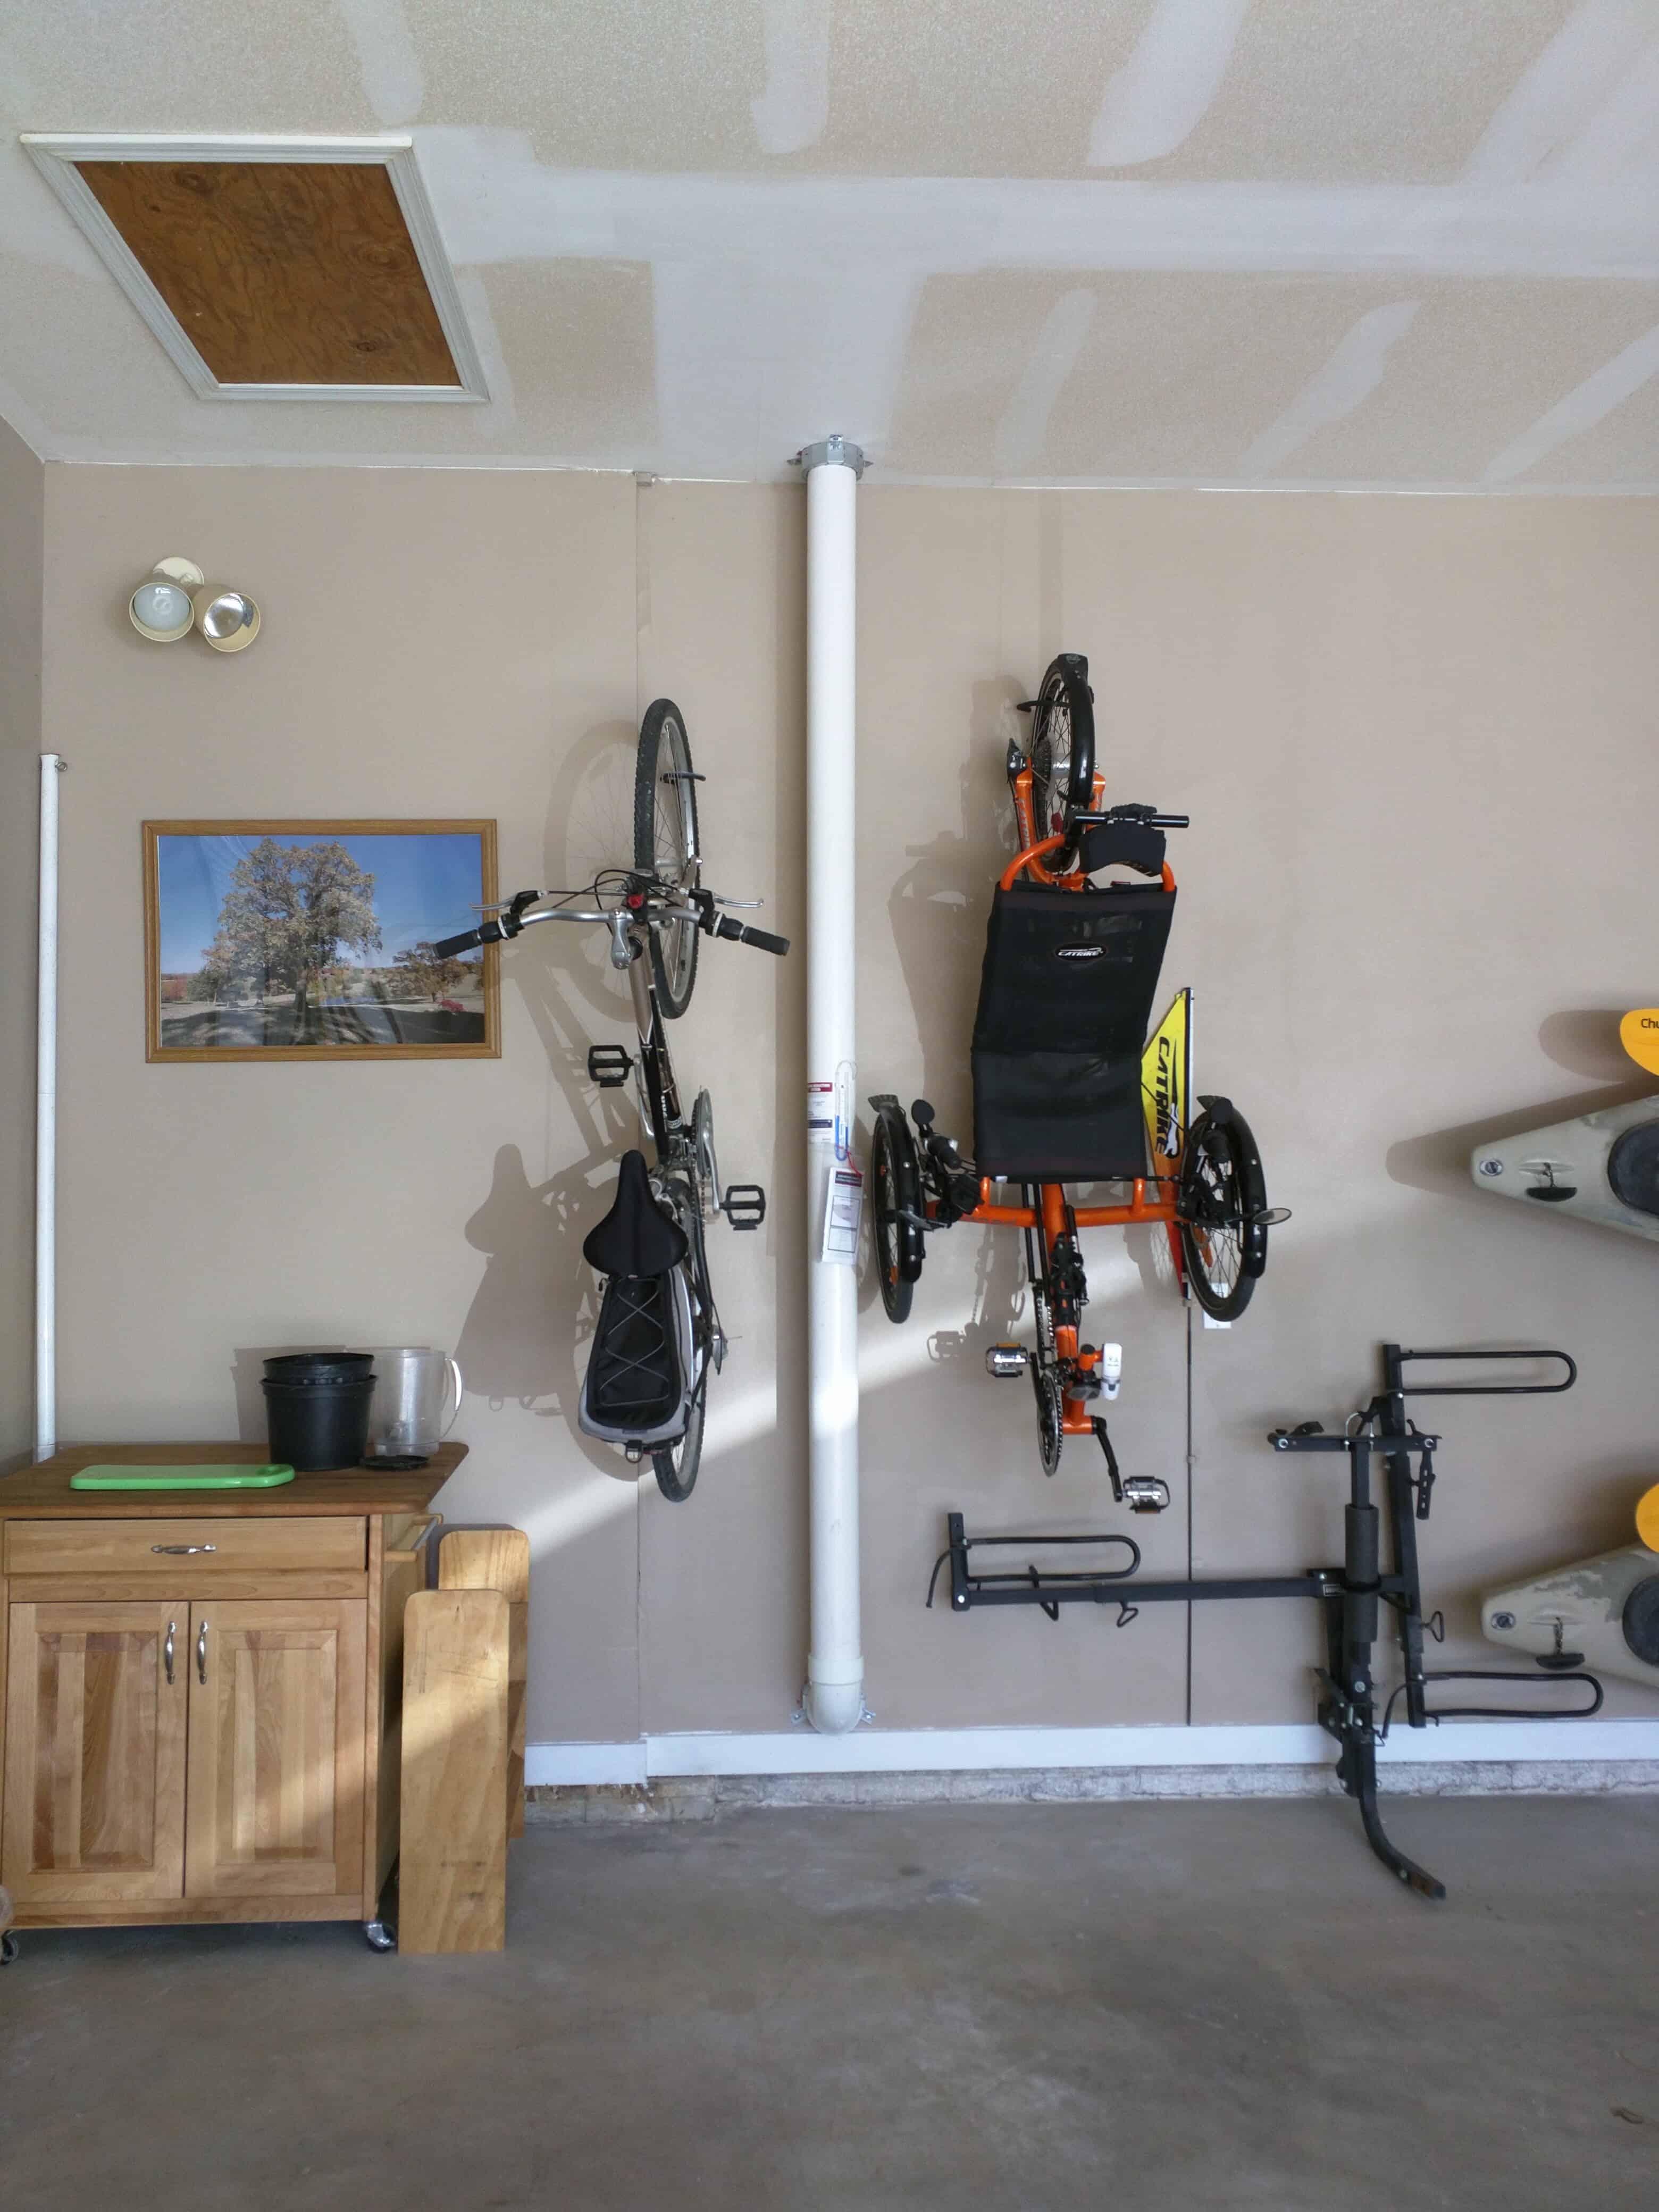 Milwaukee Radon Mitigation Mitigators 2321 S 69th St, West Allis, WI 53219 414-433-9400 Tucked Along Garage Wall installation https://radontestmitigation.com/